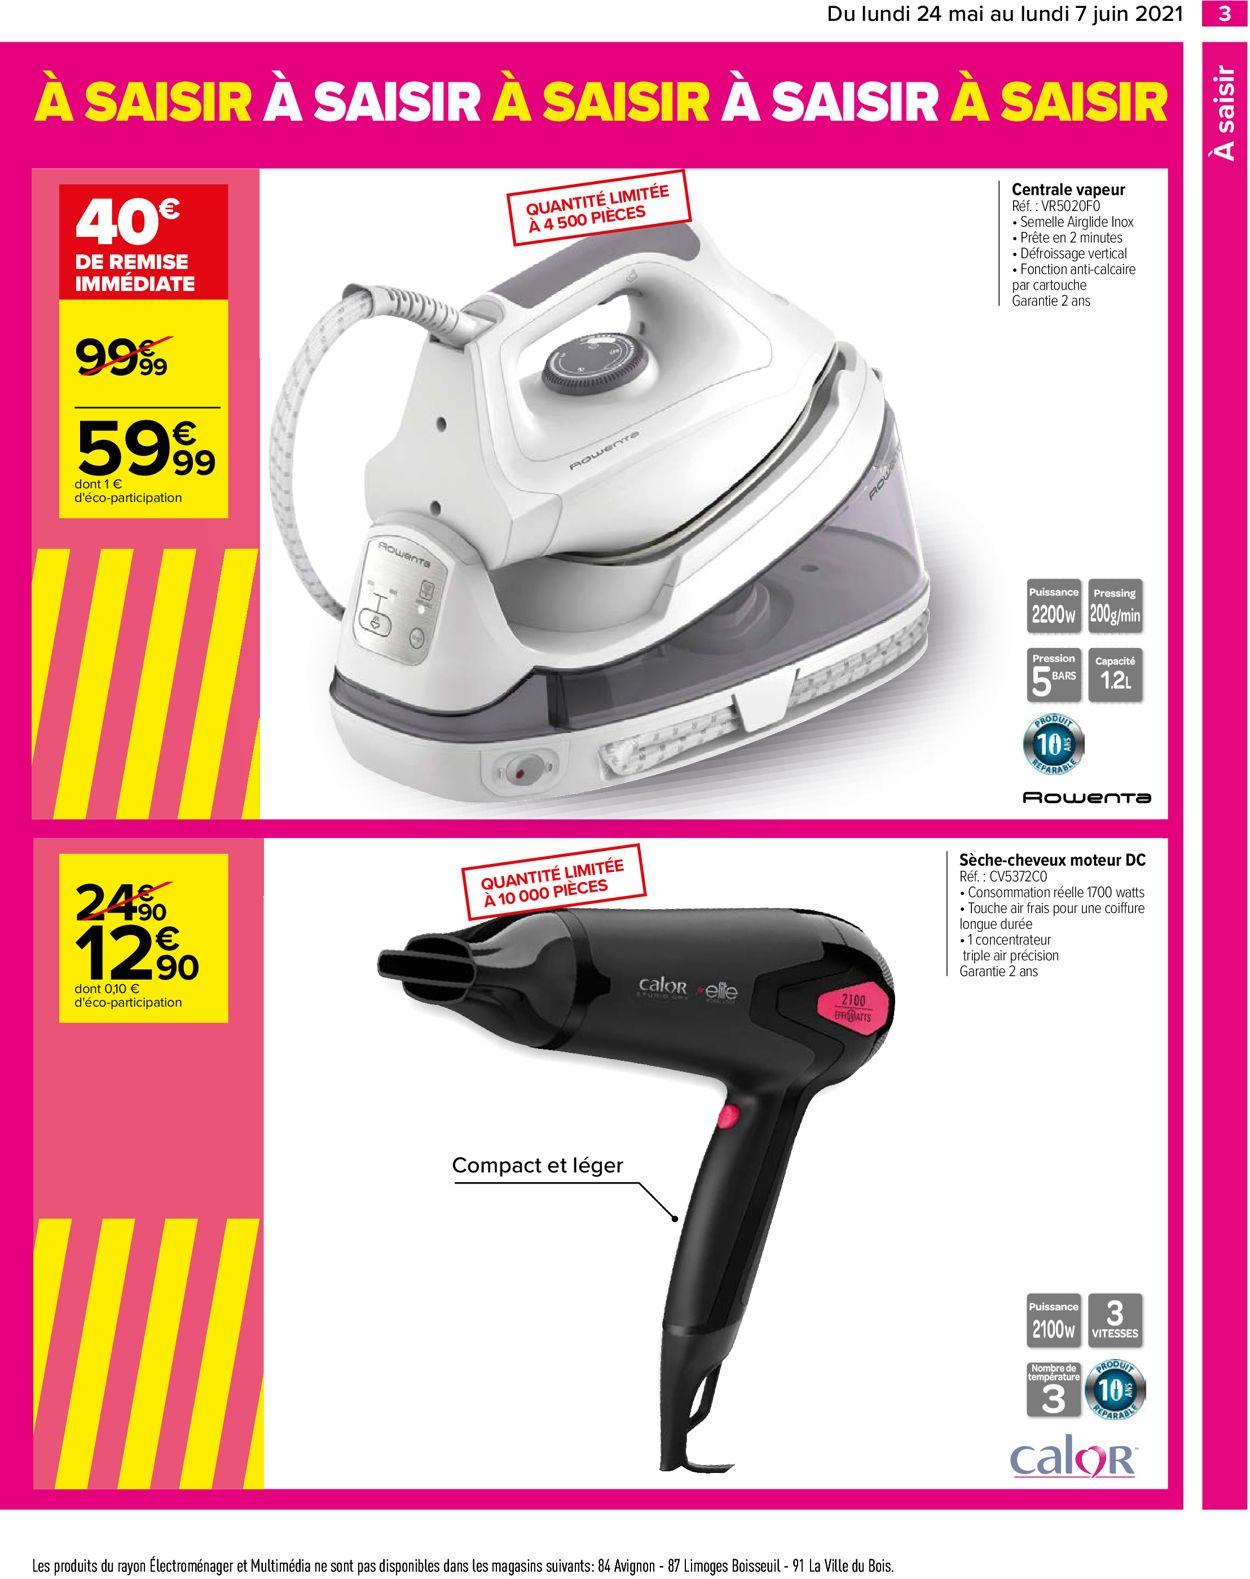 Carrefour Catalogue - 24.05-07.06.2021 (Page 3)